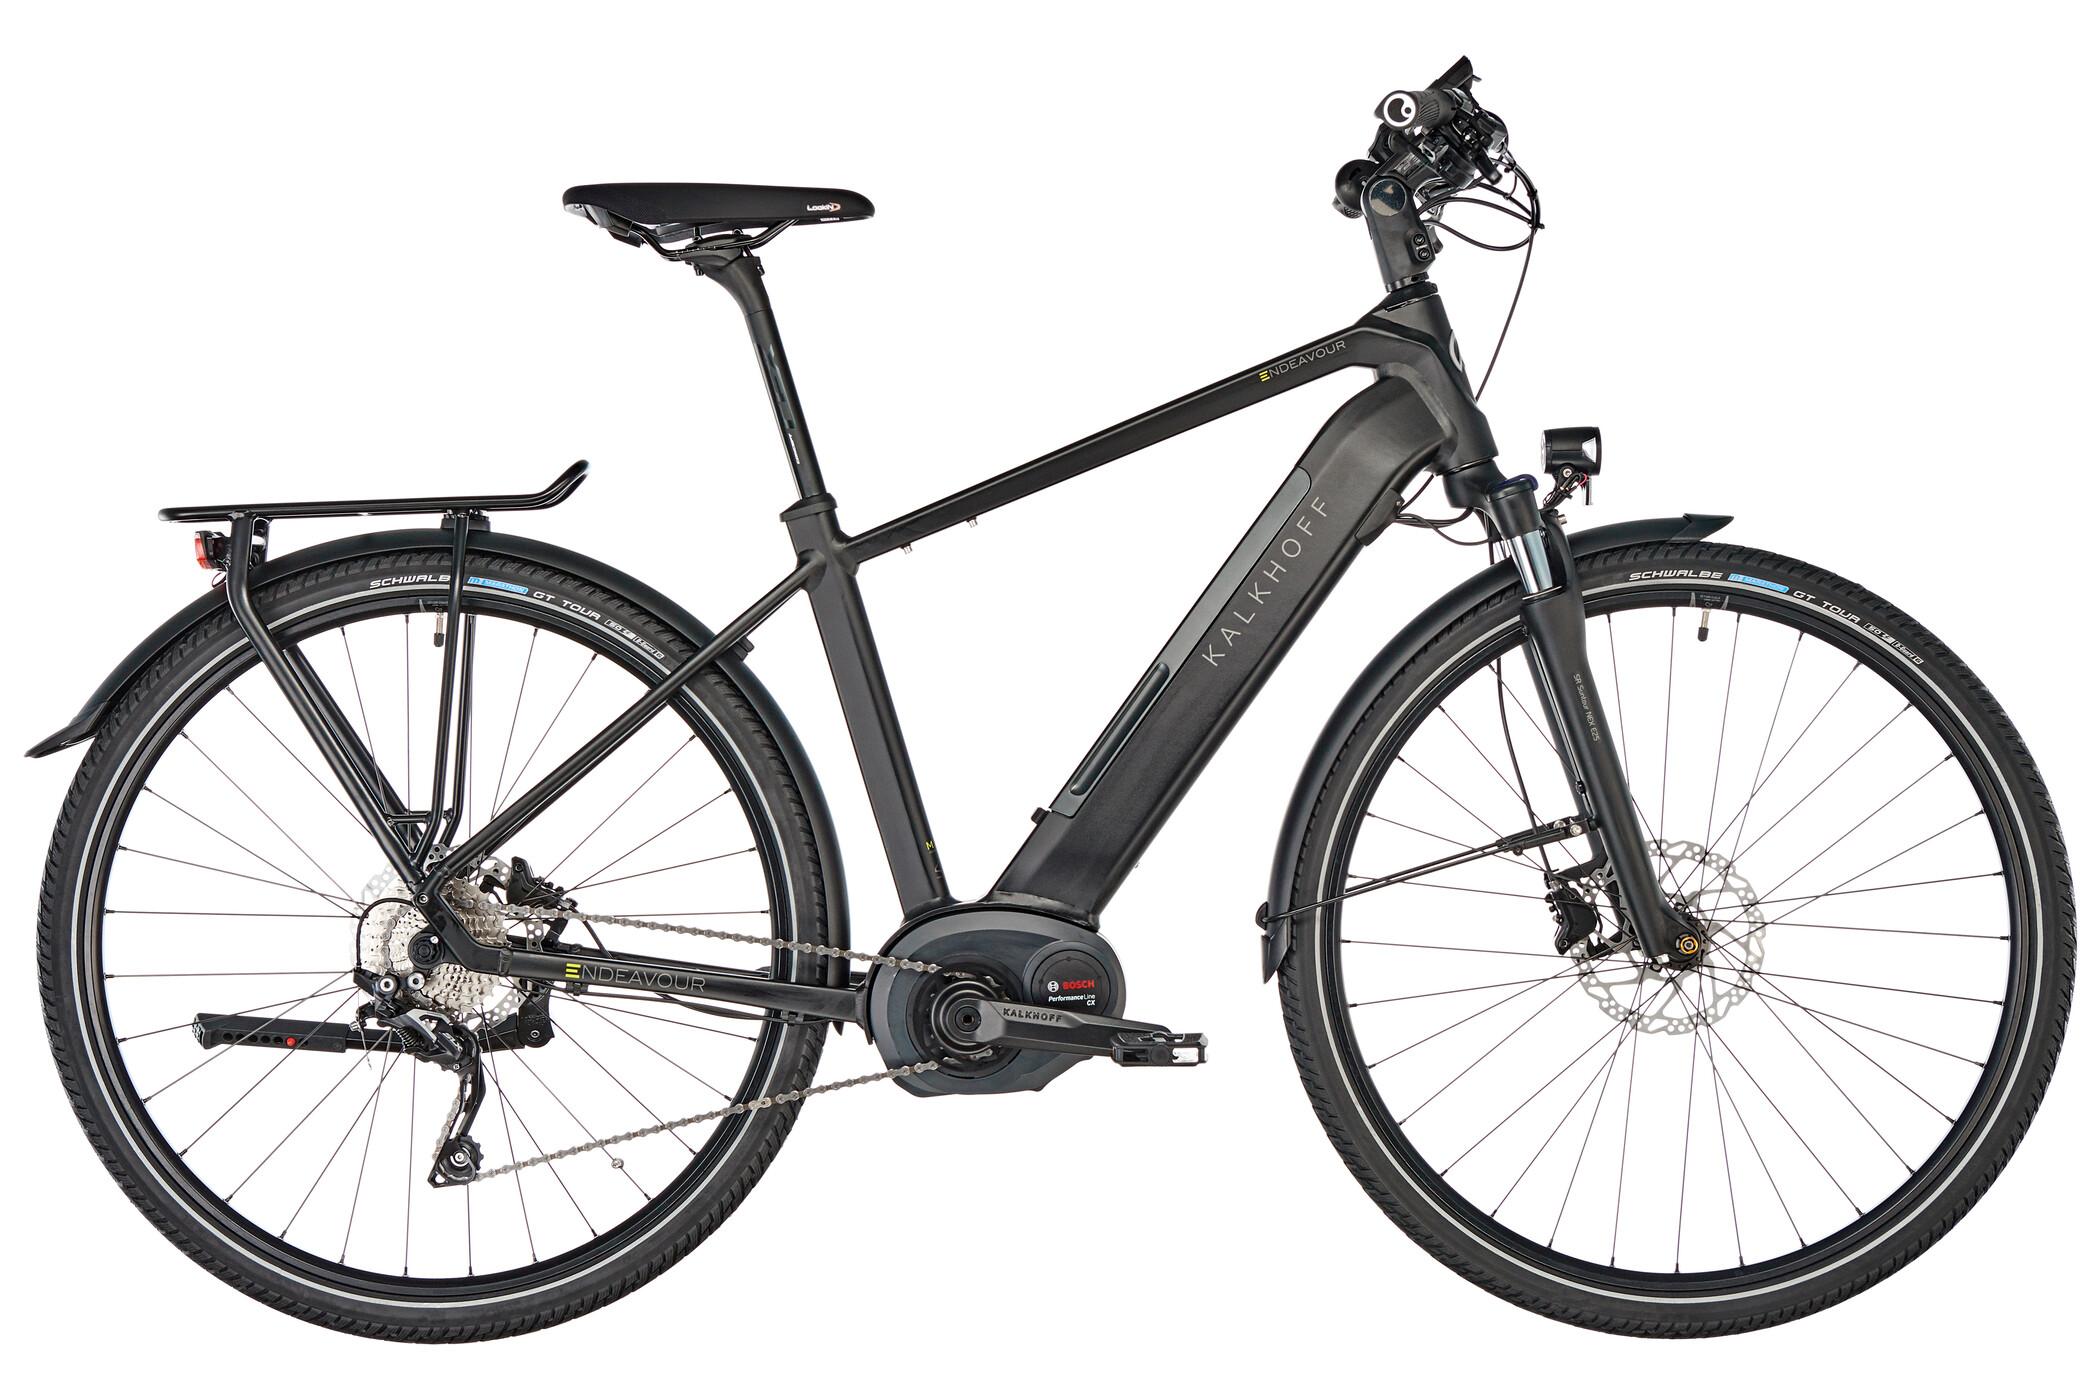 "Kalkhoff Endeavour Advance B10 E-trekkingcykel 28"" 500Wh sort (2019) | City-cykler"